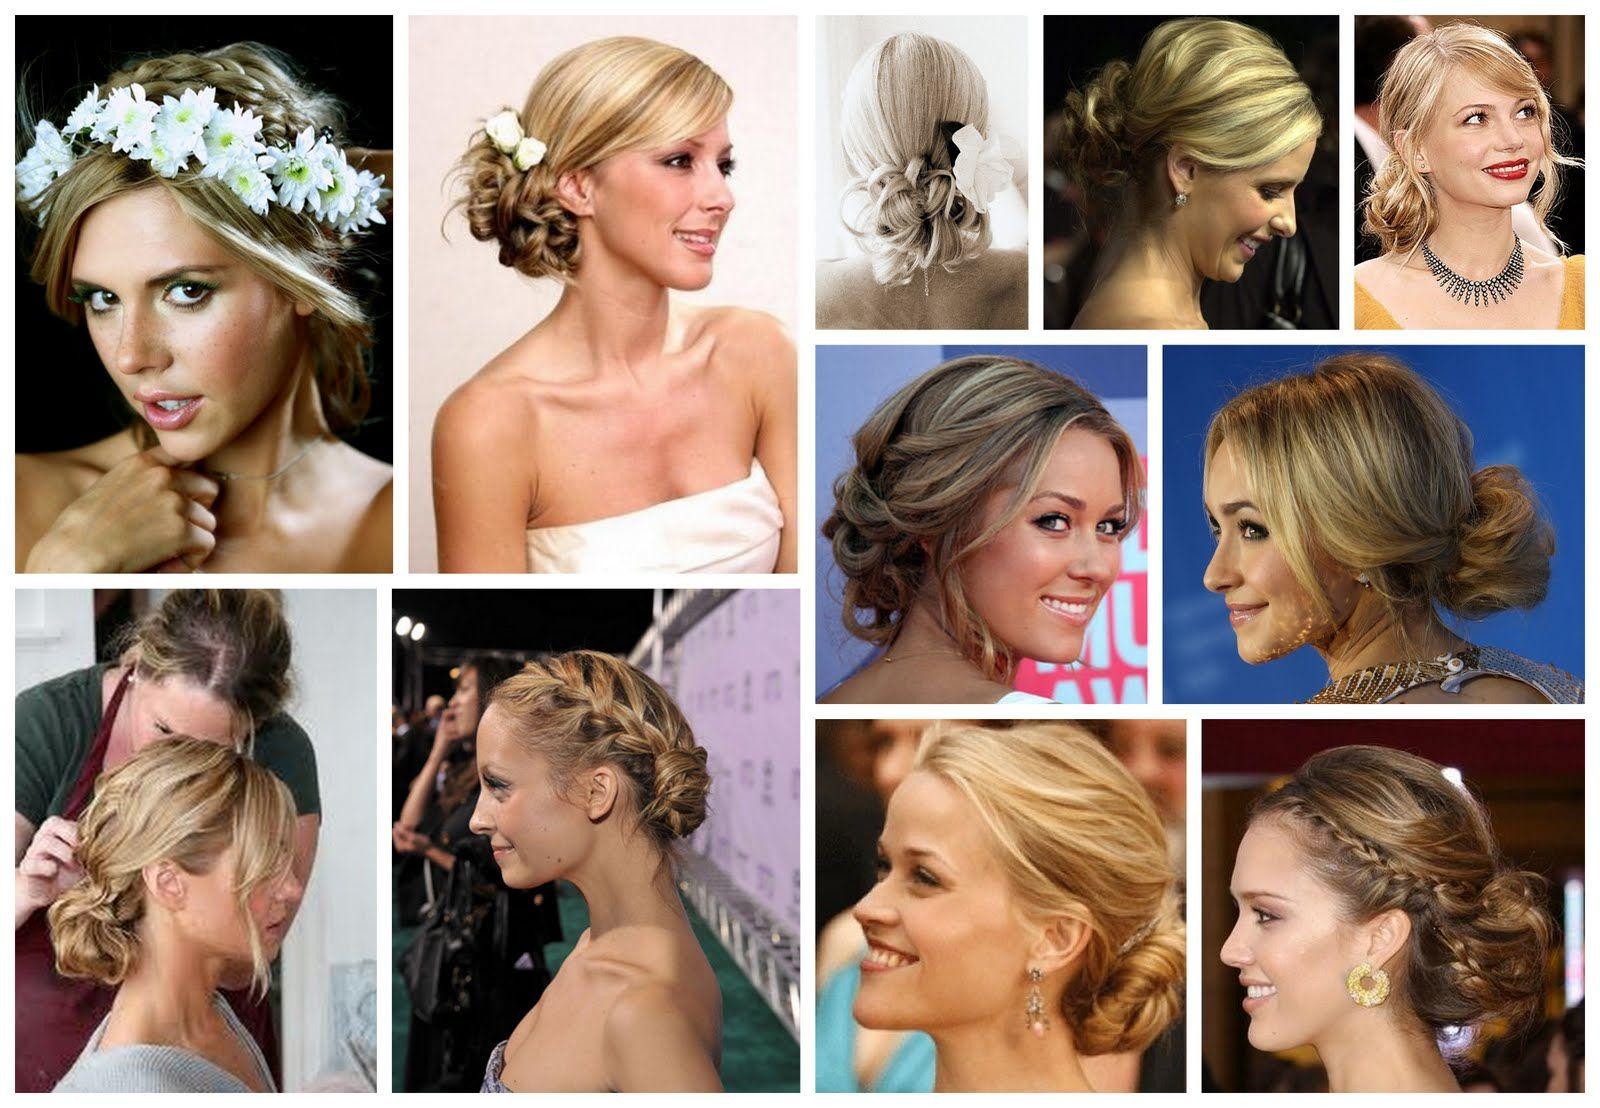 ... wedding hair ideas . Before the Big Day - The Best UK Wedding Blog